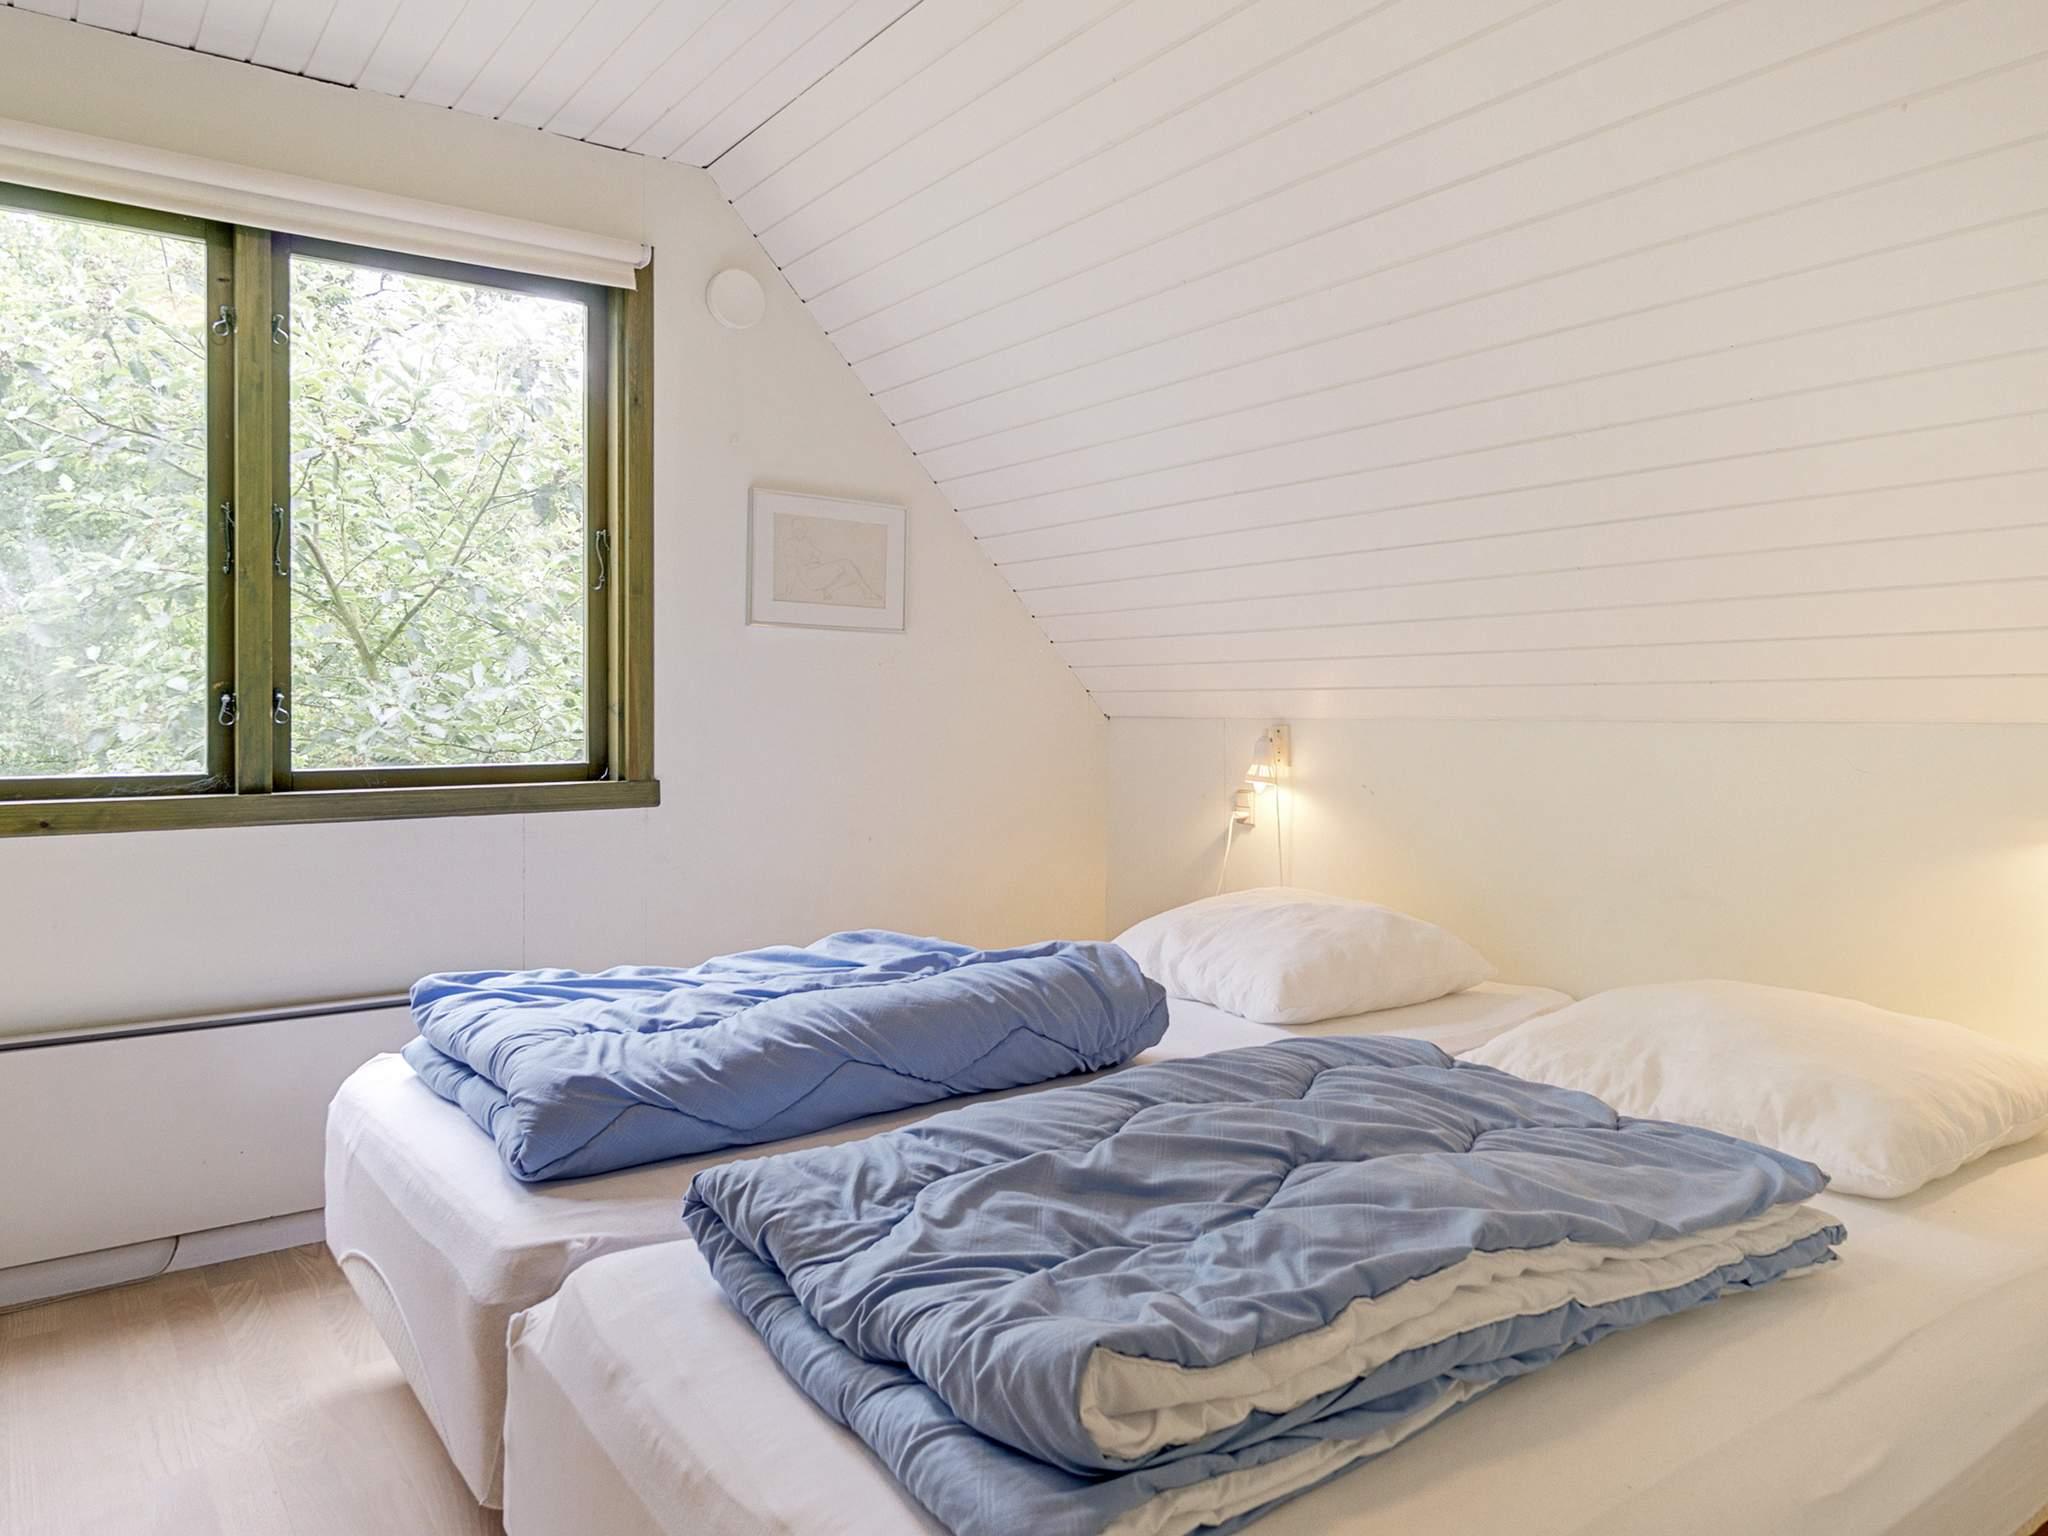 Ferienhaus Balka Strand (660138), Balke, , Bornholm, Dänemark, Bild 6